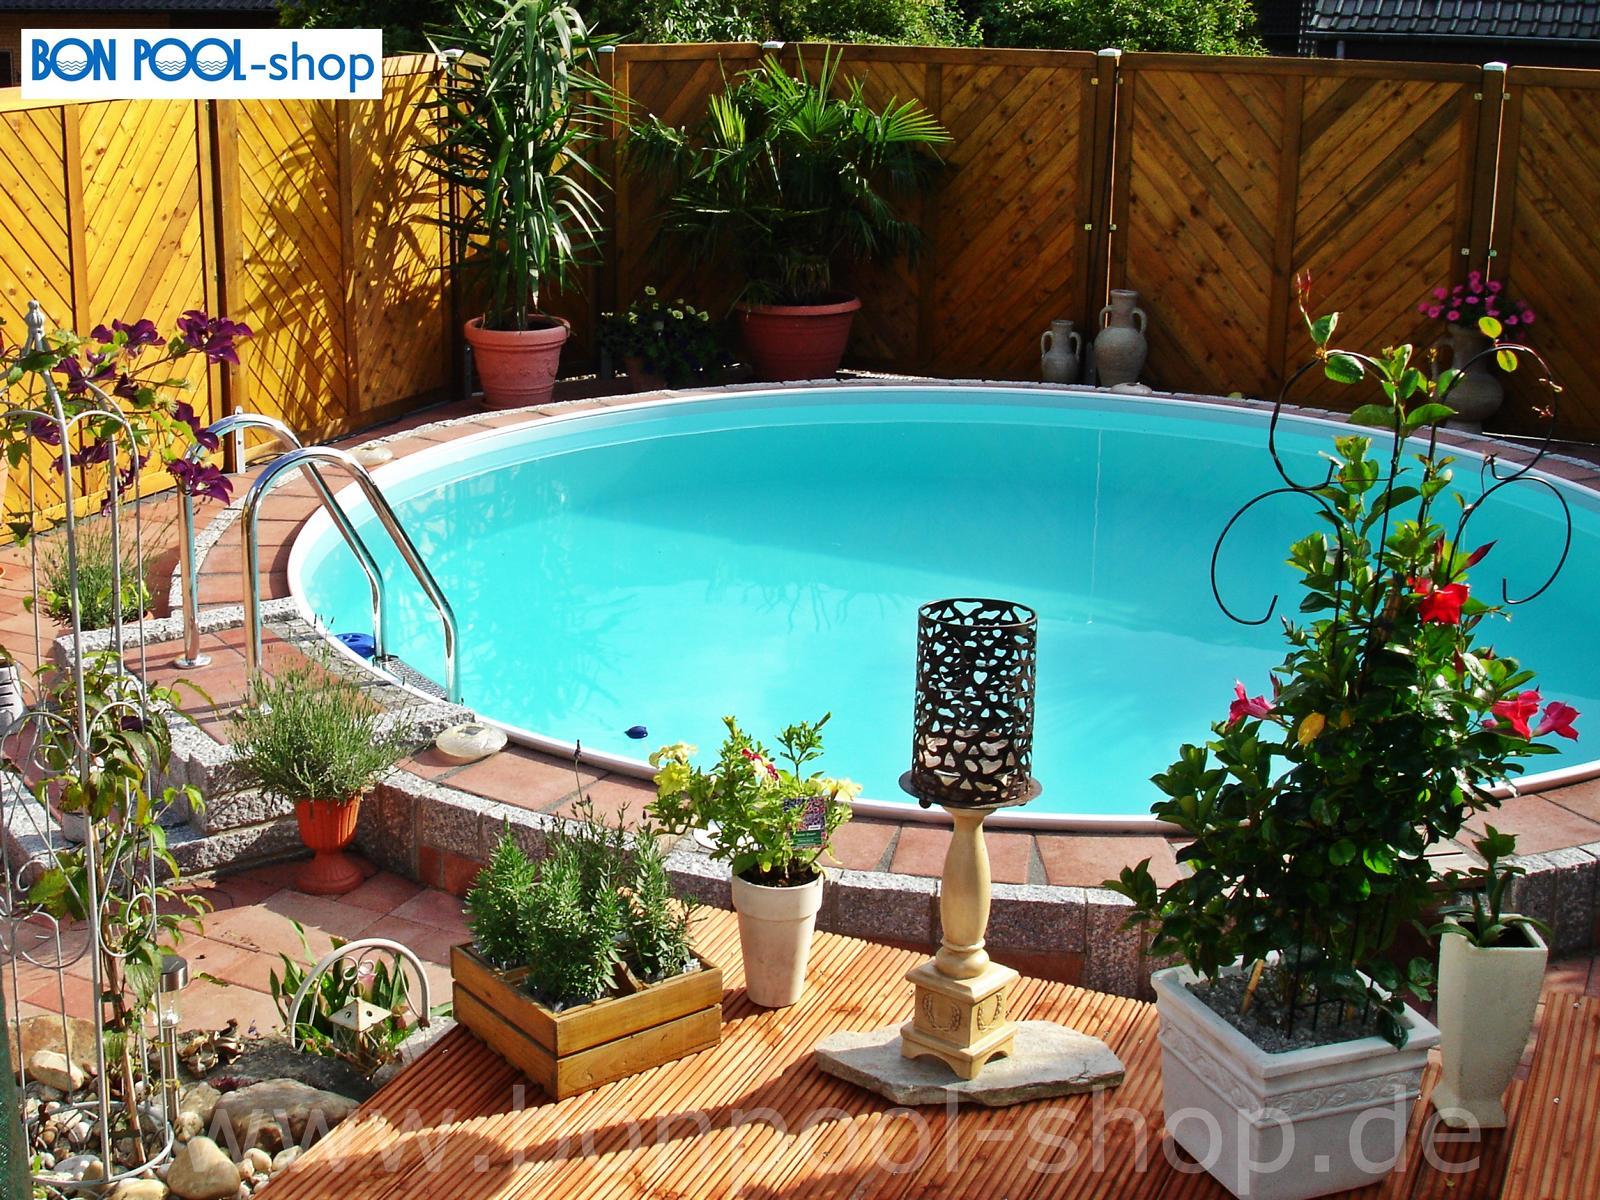 Rundpool stahlwandbecken tiefe 120 400 set bonpool for Pool ersatzteile stahlwand